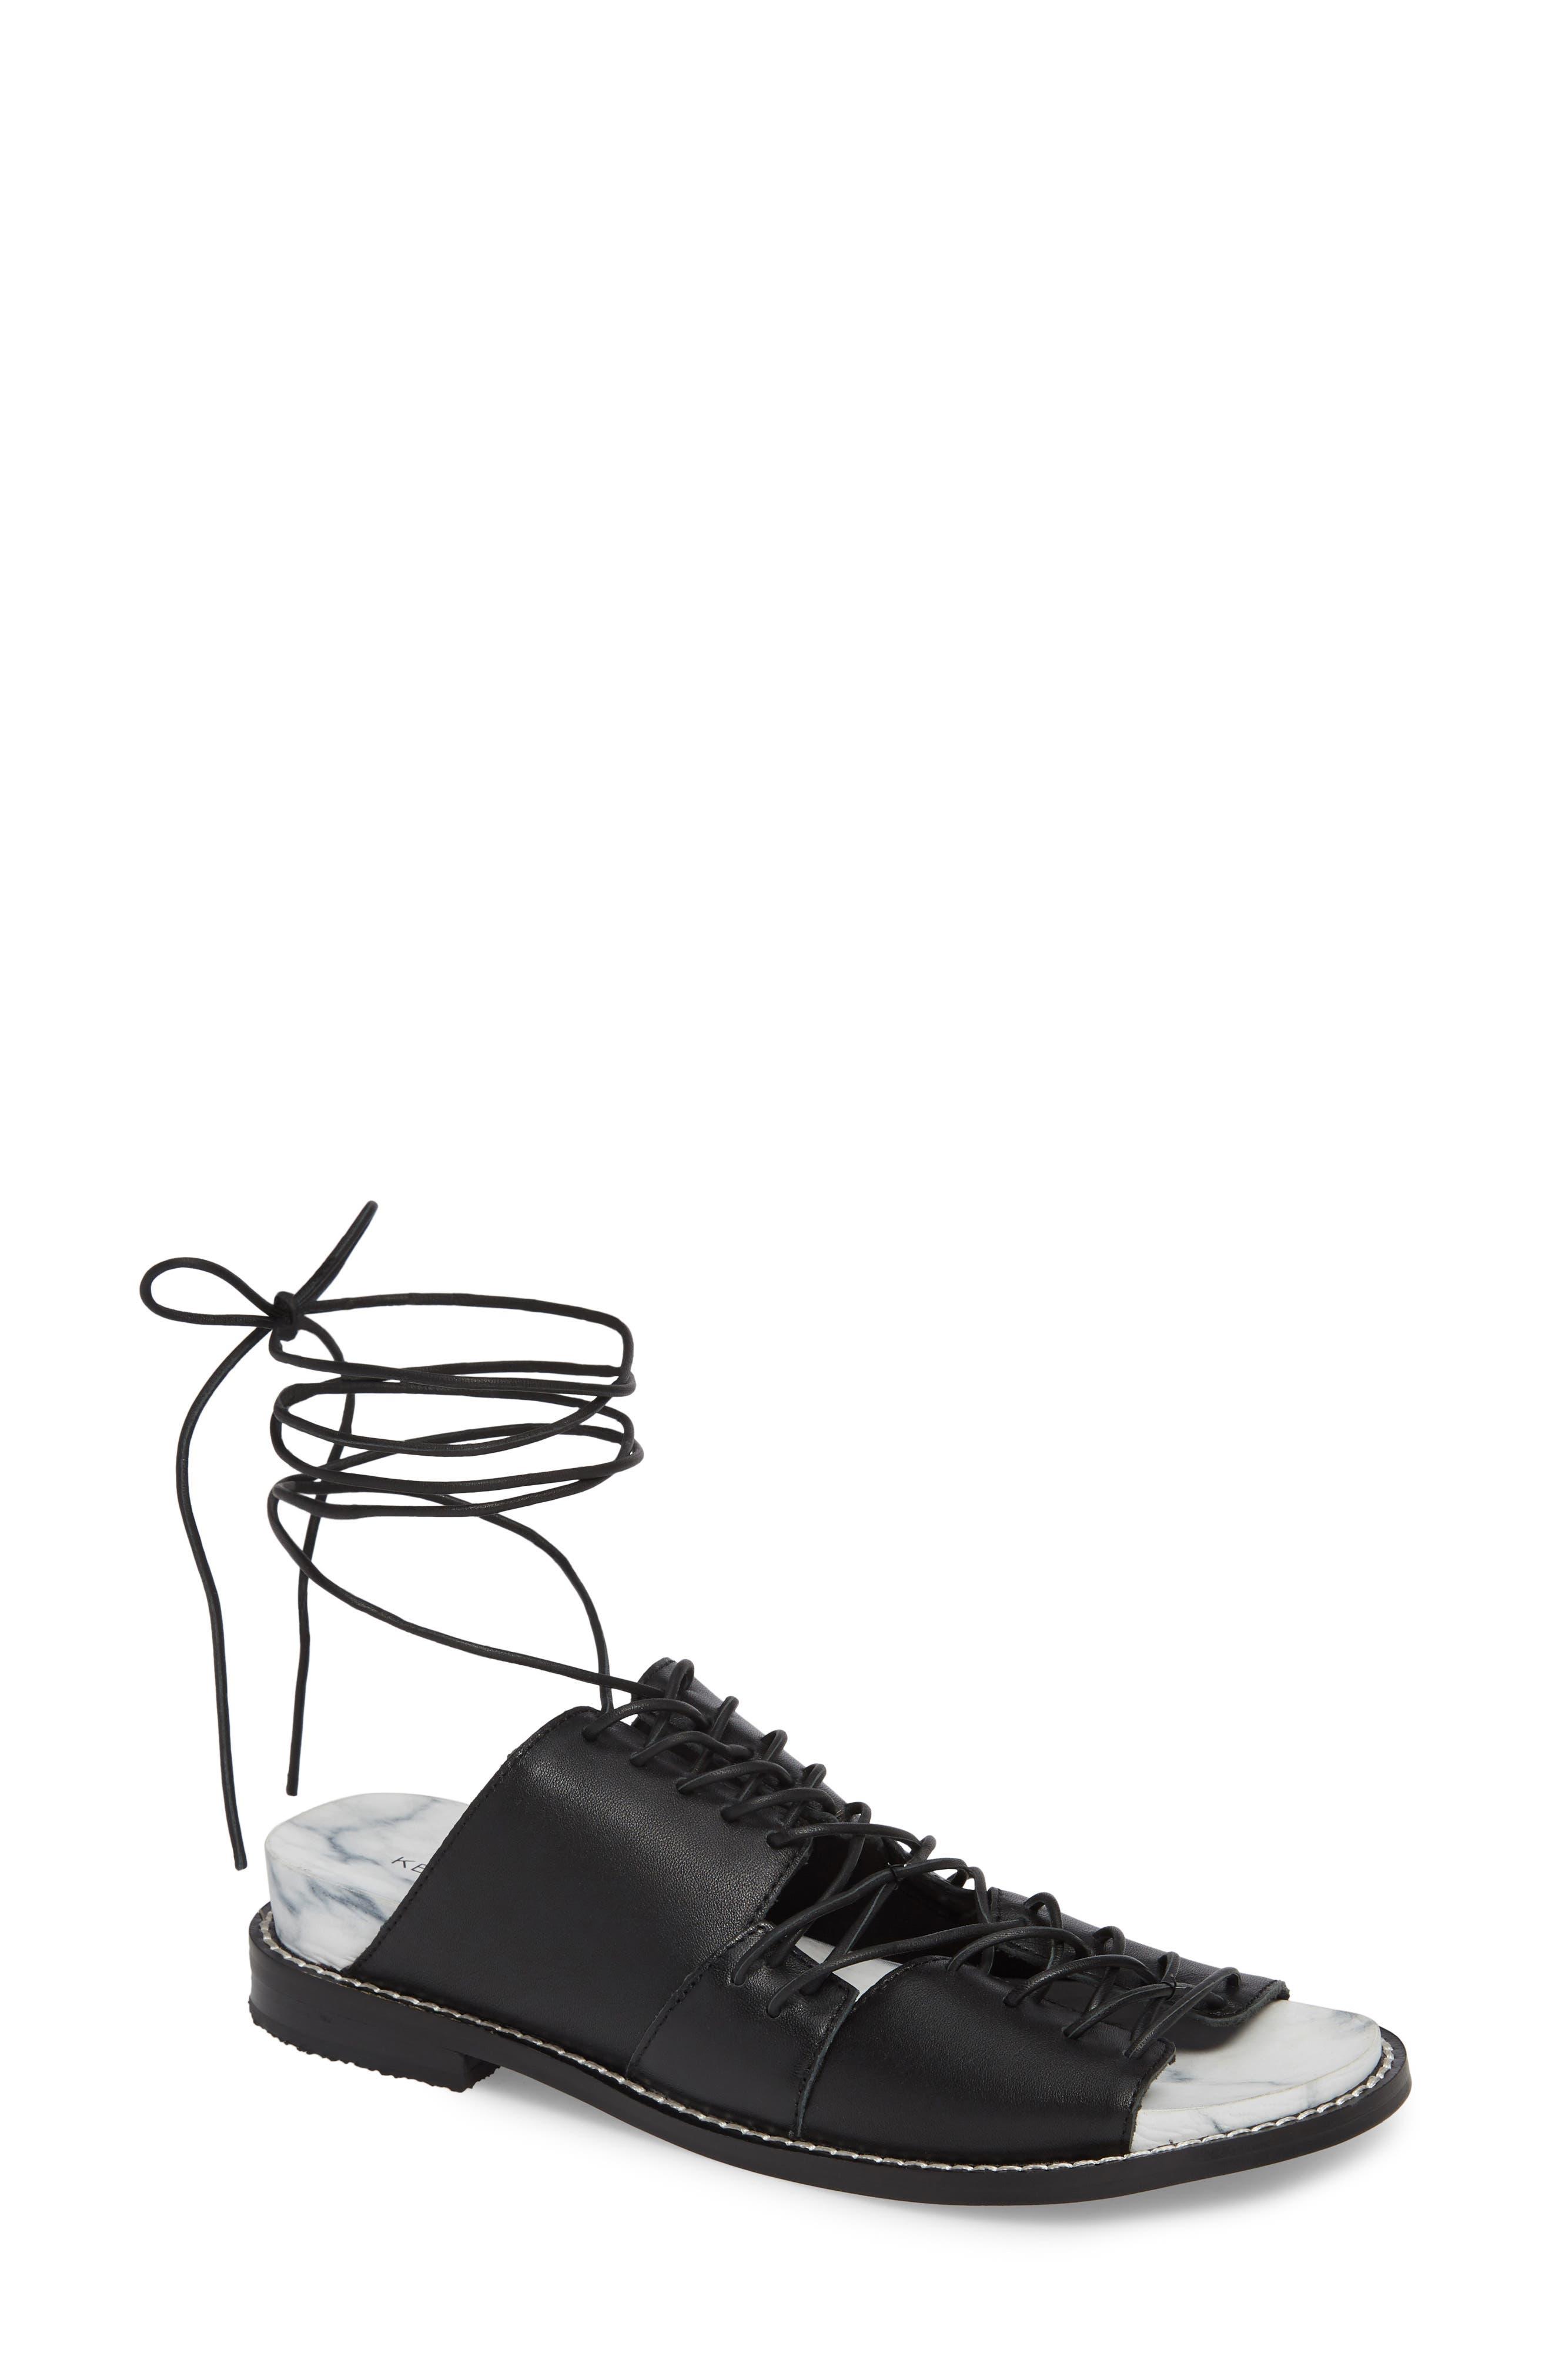 Kelsi Dagger Brooklyn Olympia Sandal